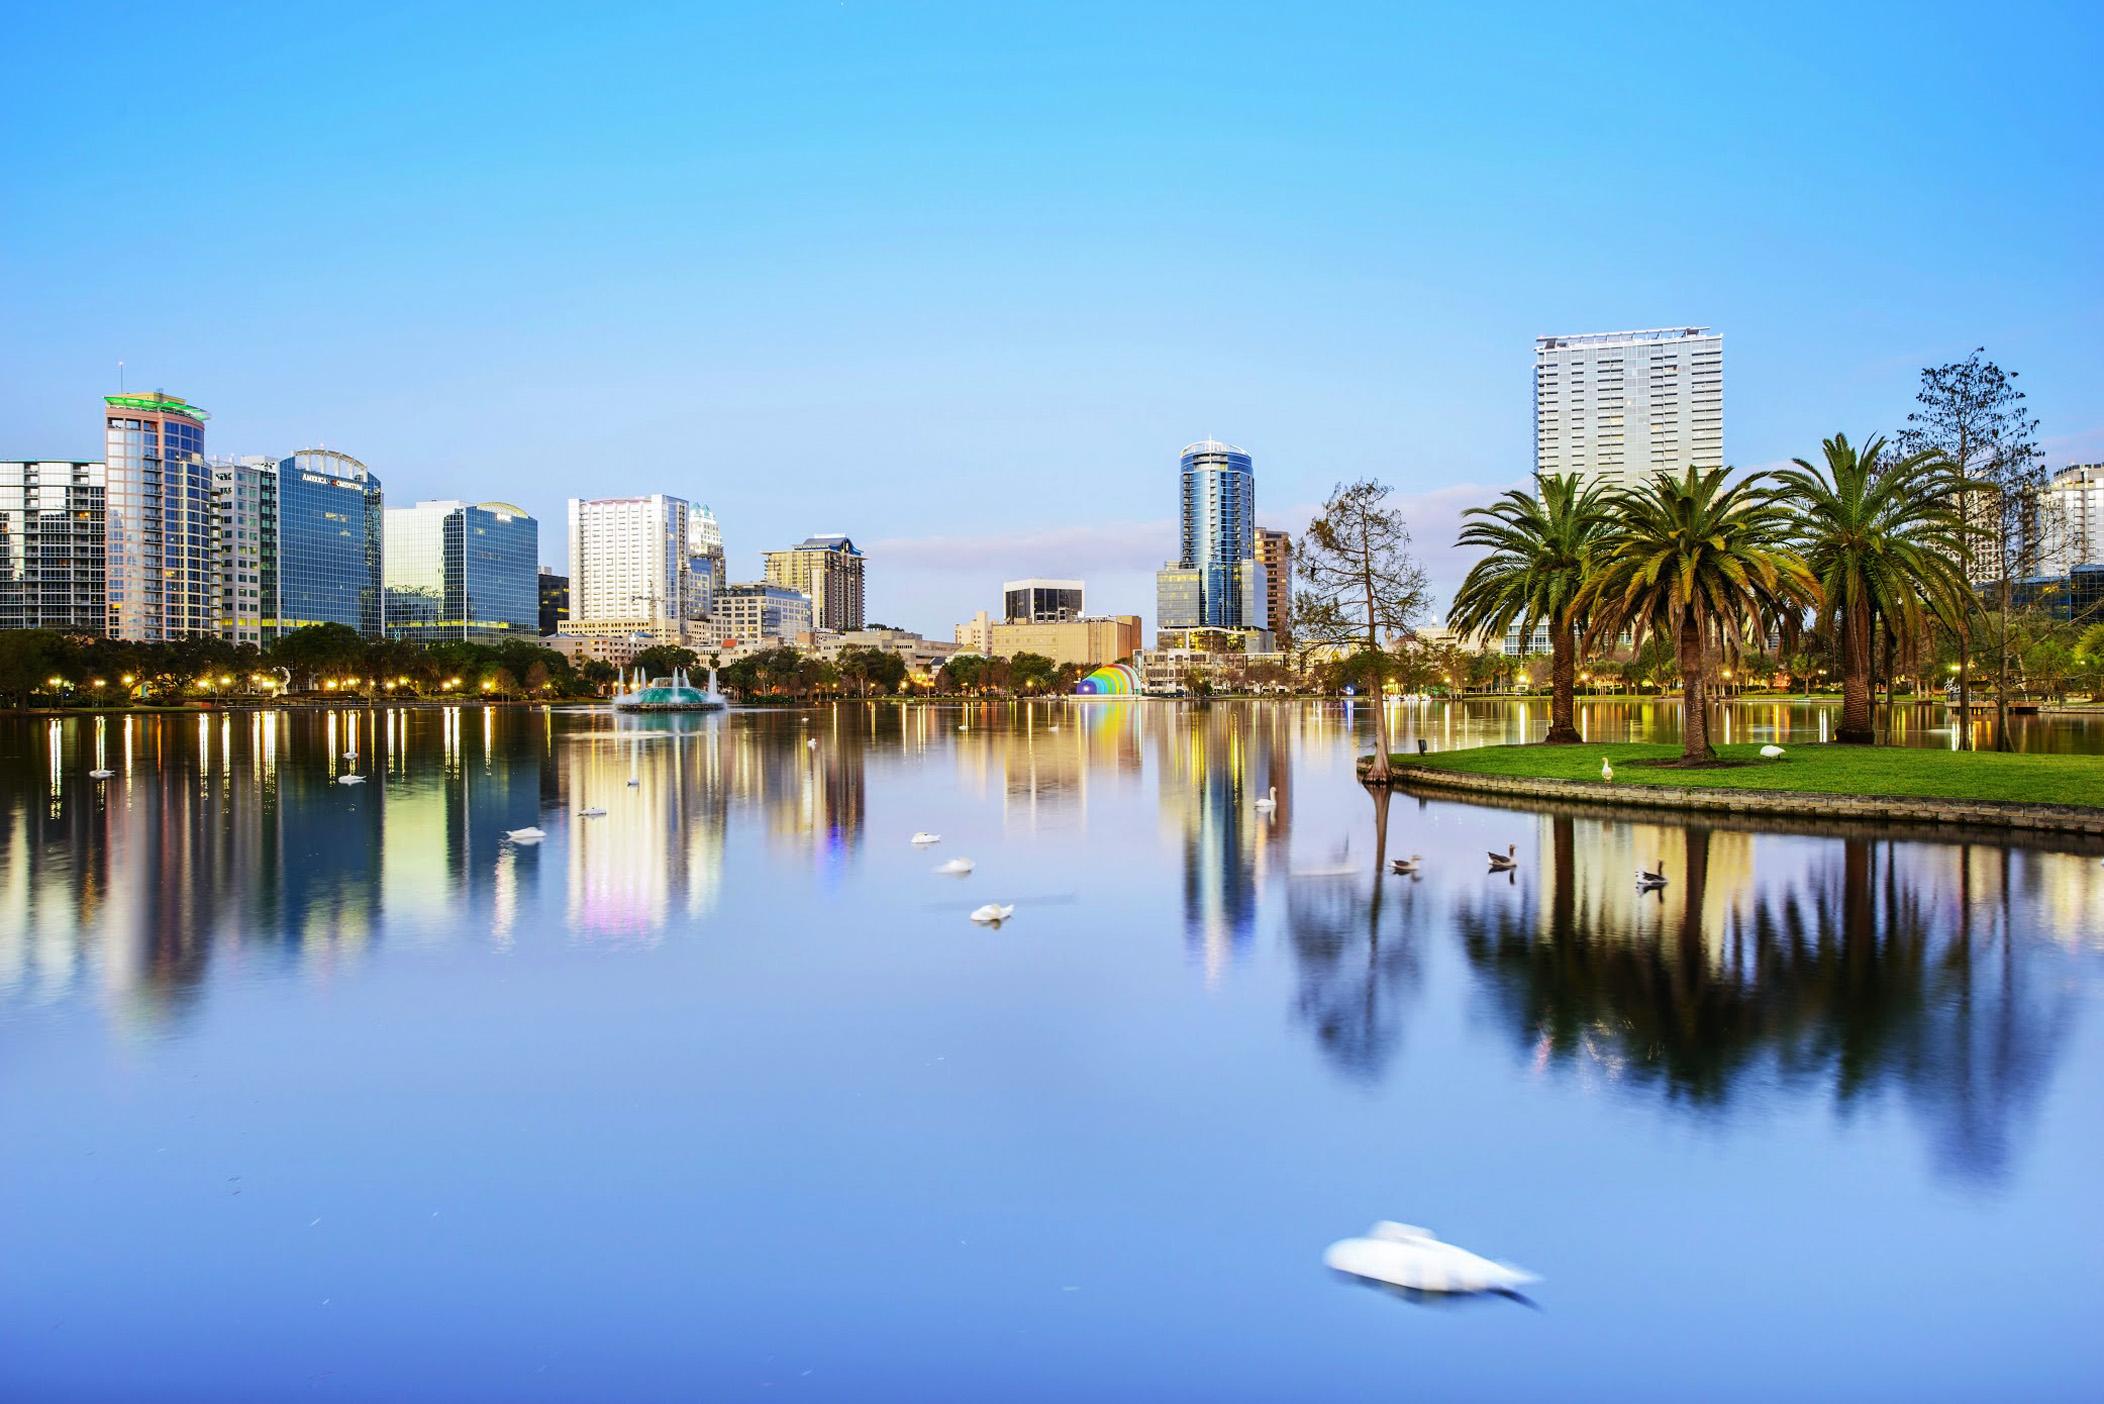 Orlando-La Florida